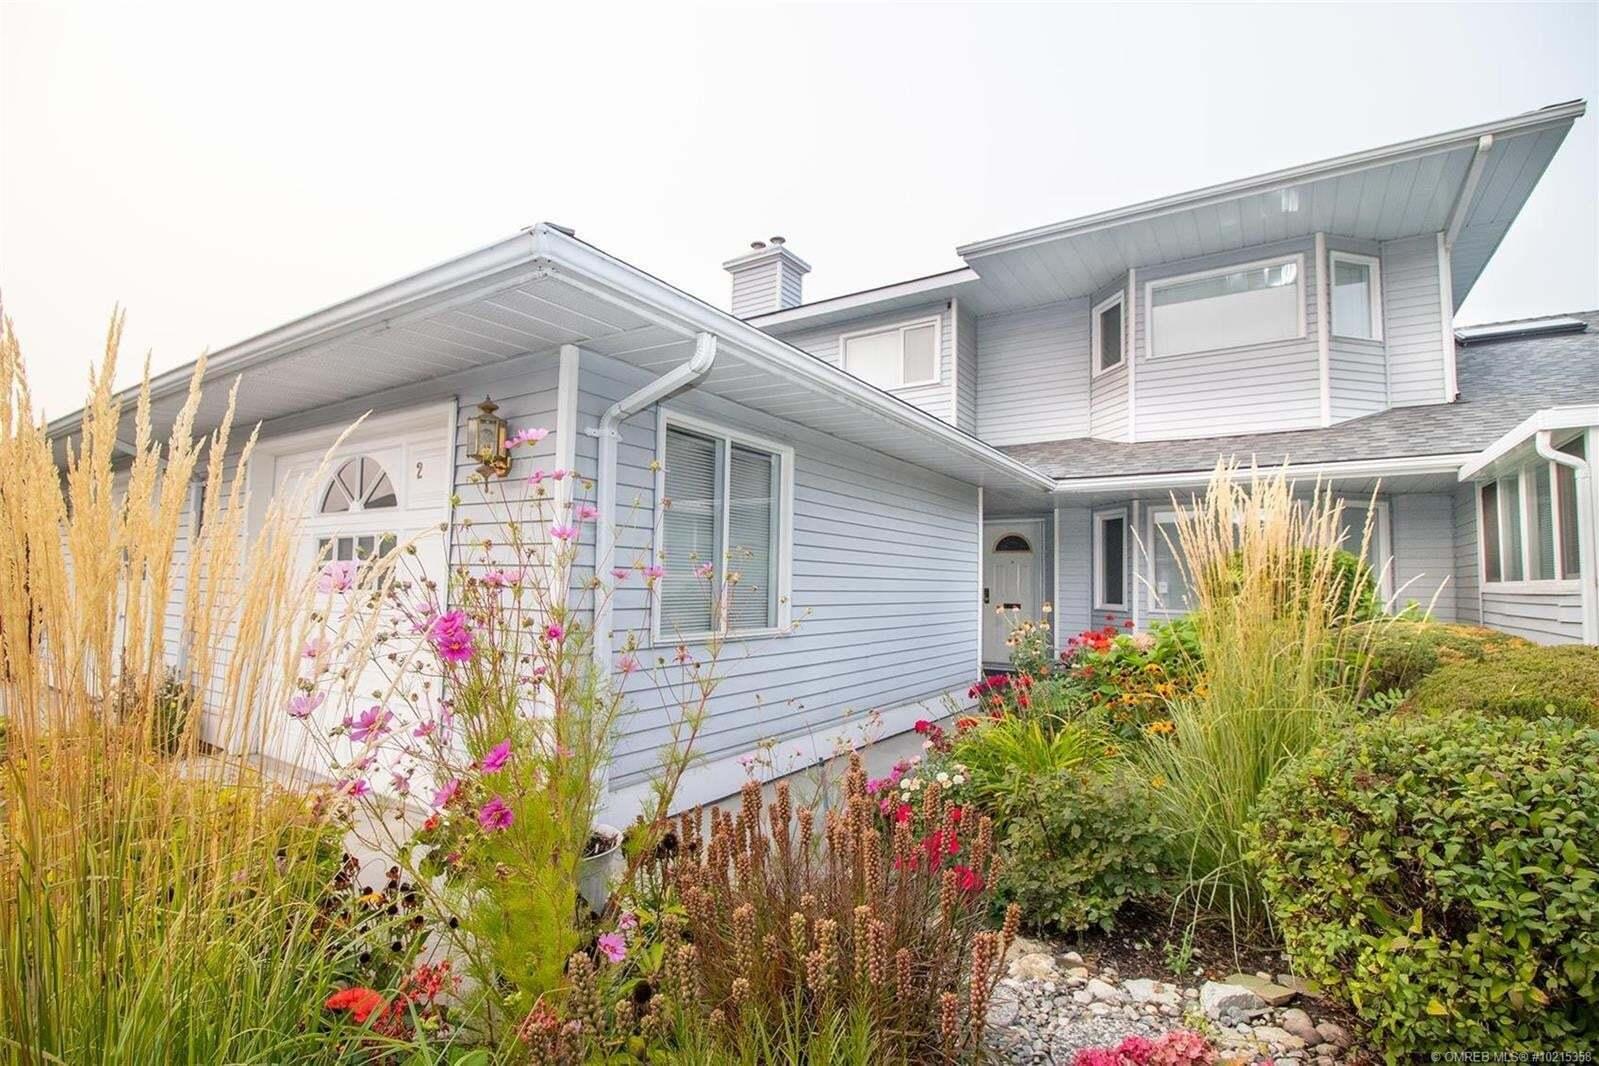 Townhouse for sale at 3370 Casorso Rd Kelowna British Columbia - MLS: 10215358